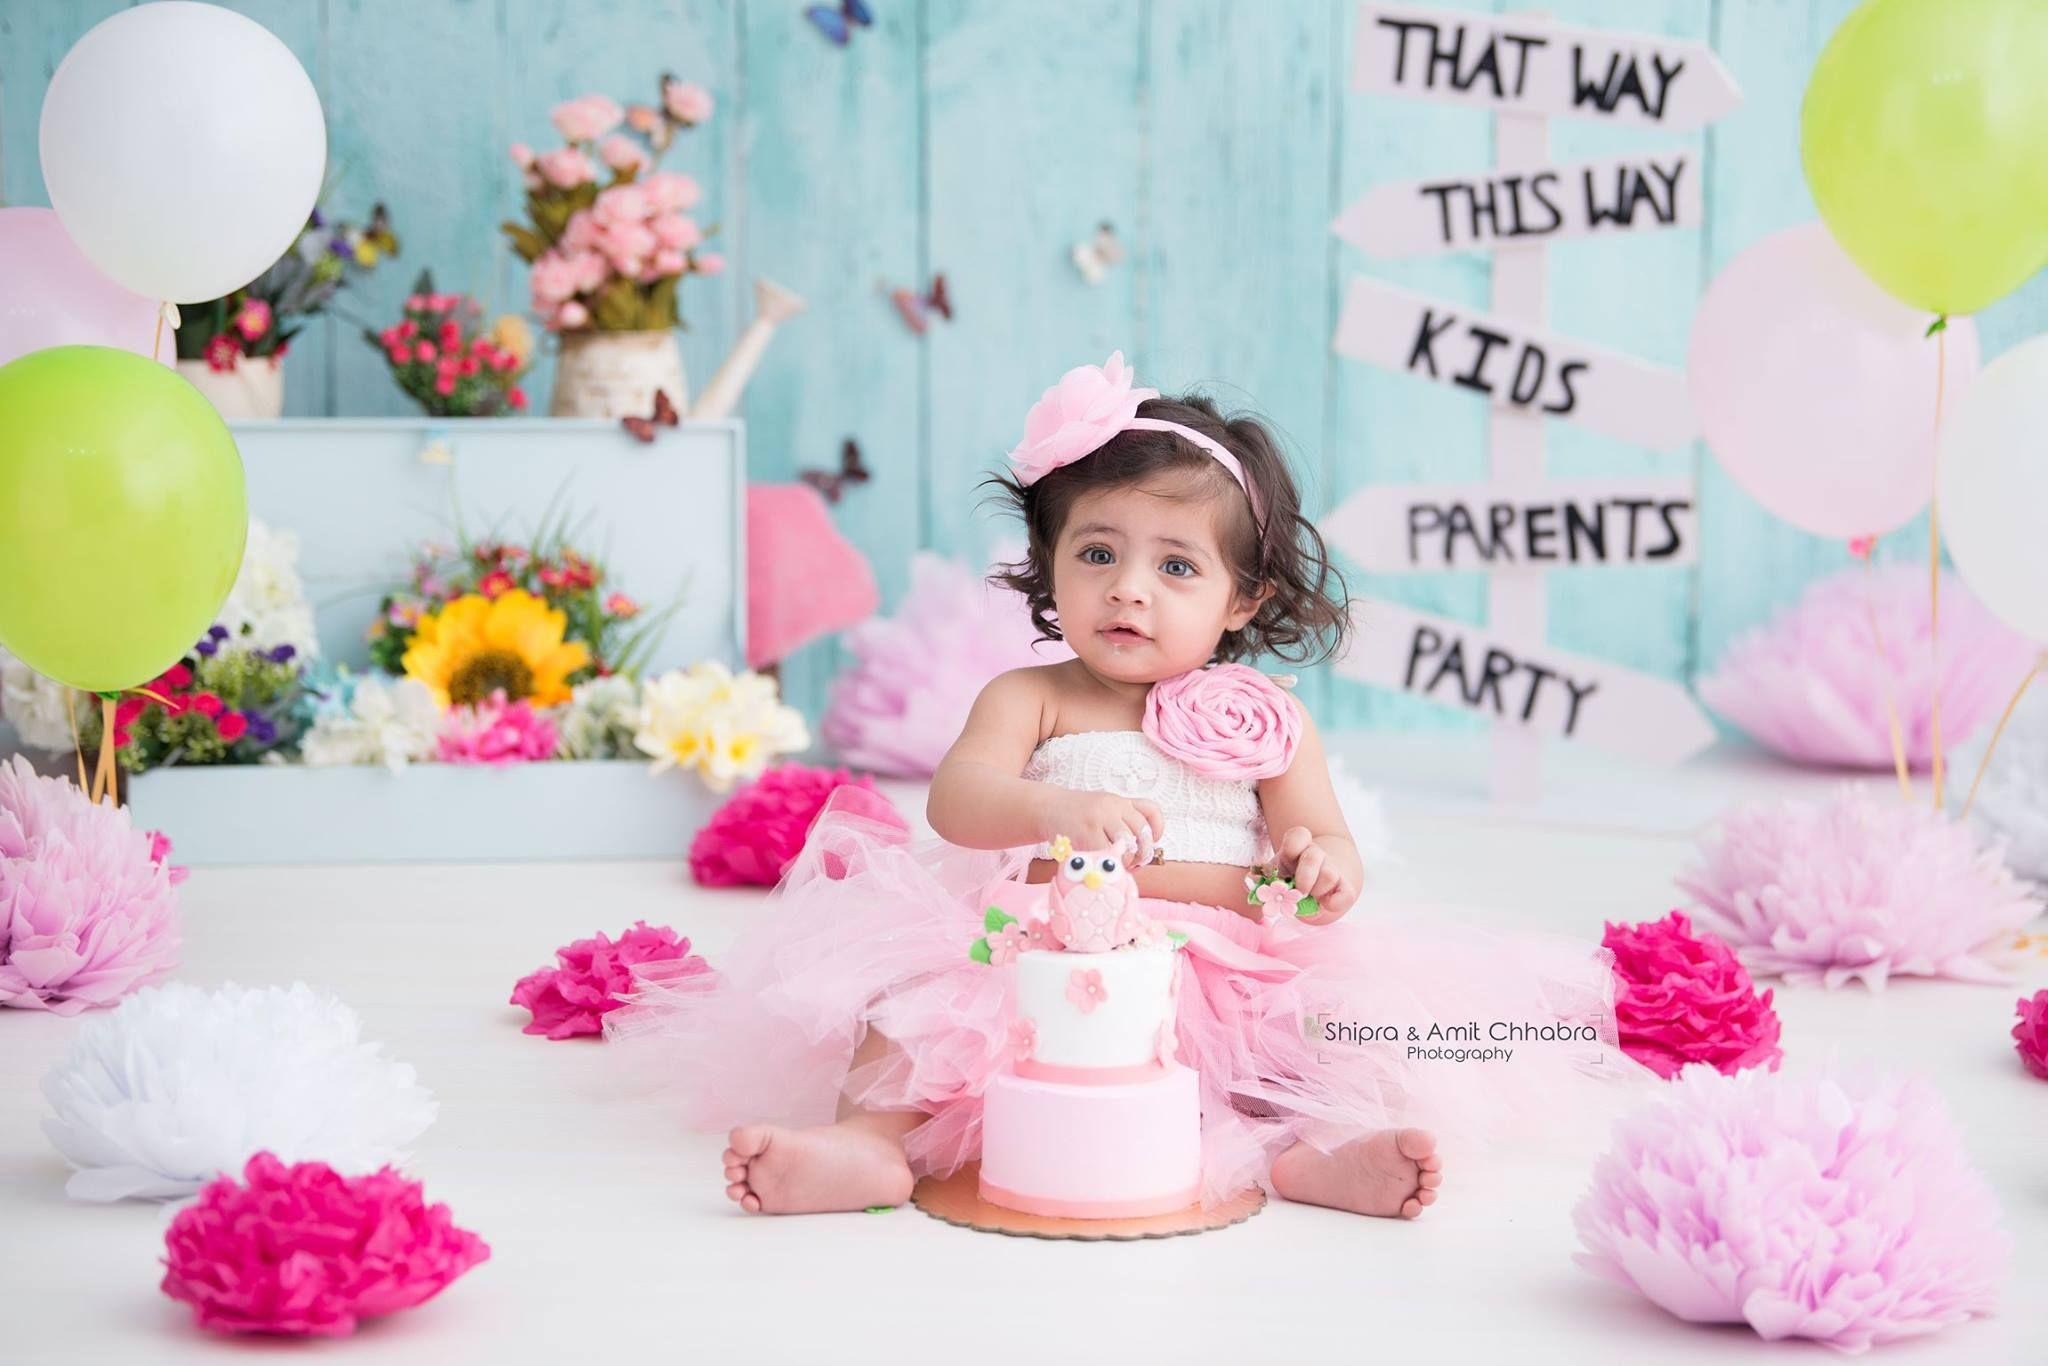 Girl cake smash photoshoot pink cake for birthday floral theme set up kids photography shipra amit chhabra photography delhi ncr